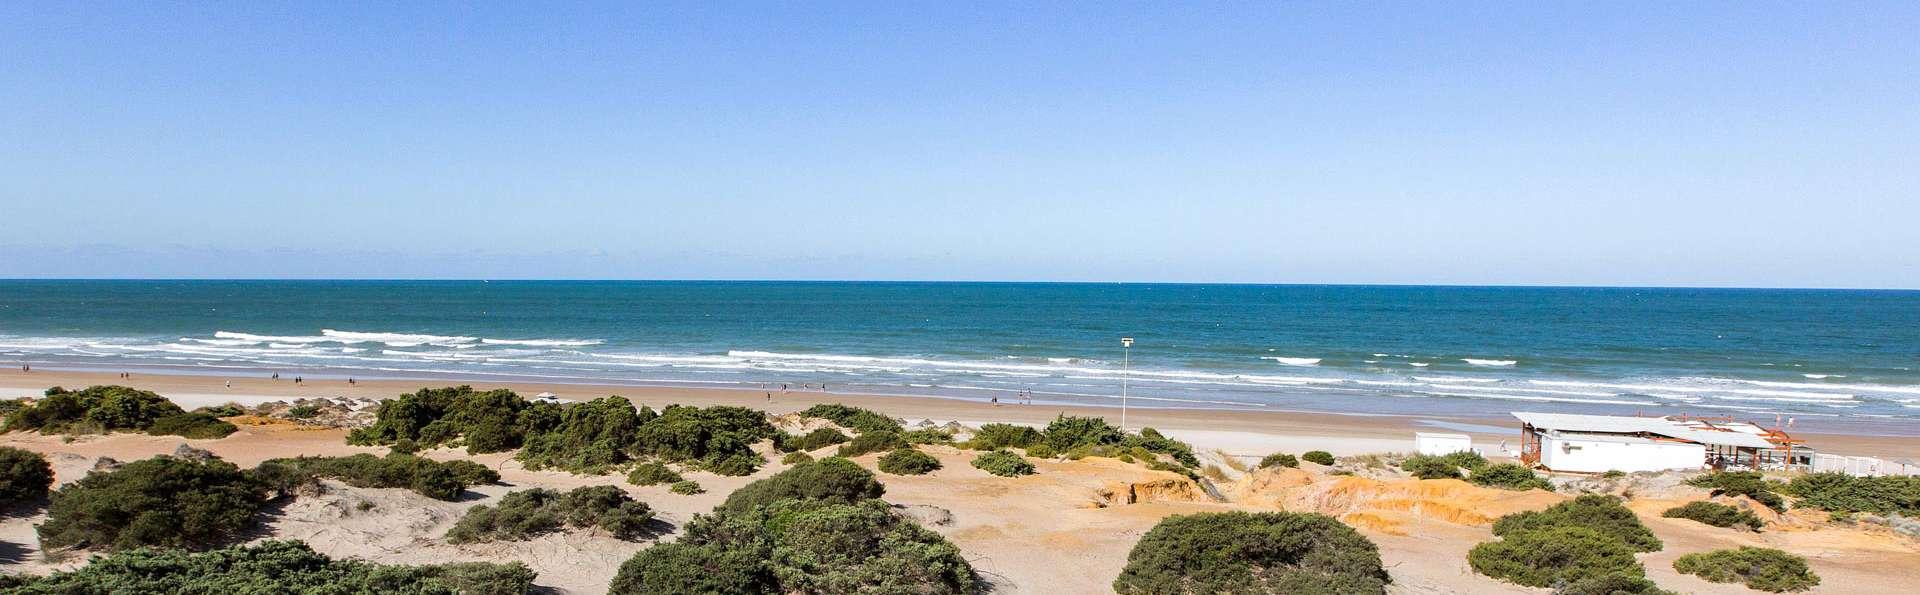 Hipotels Playa La Barrosa (Adults Only) - EDIT_VIEW_01.jpg